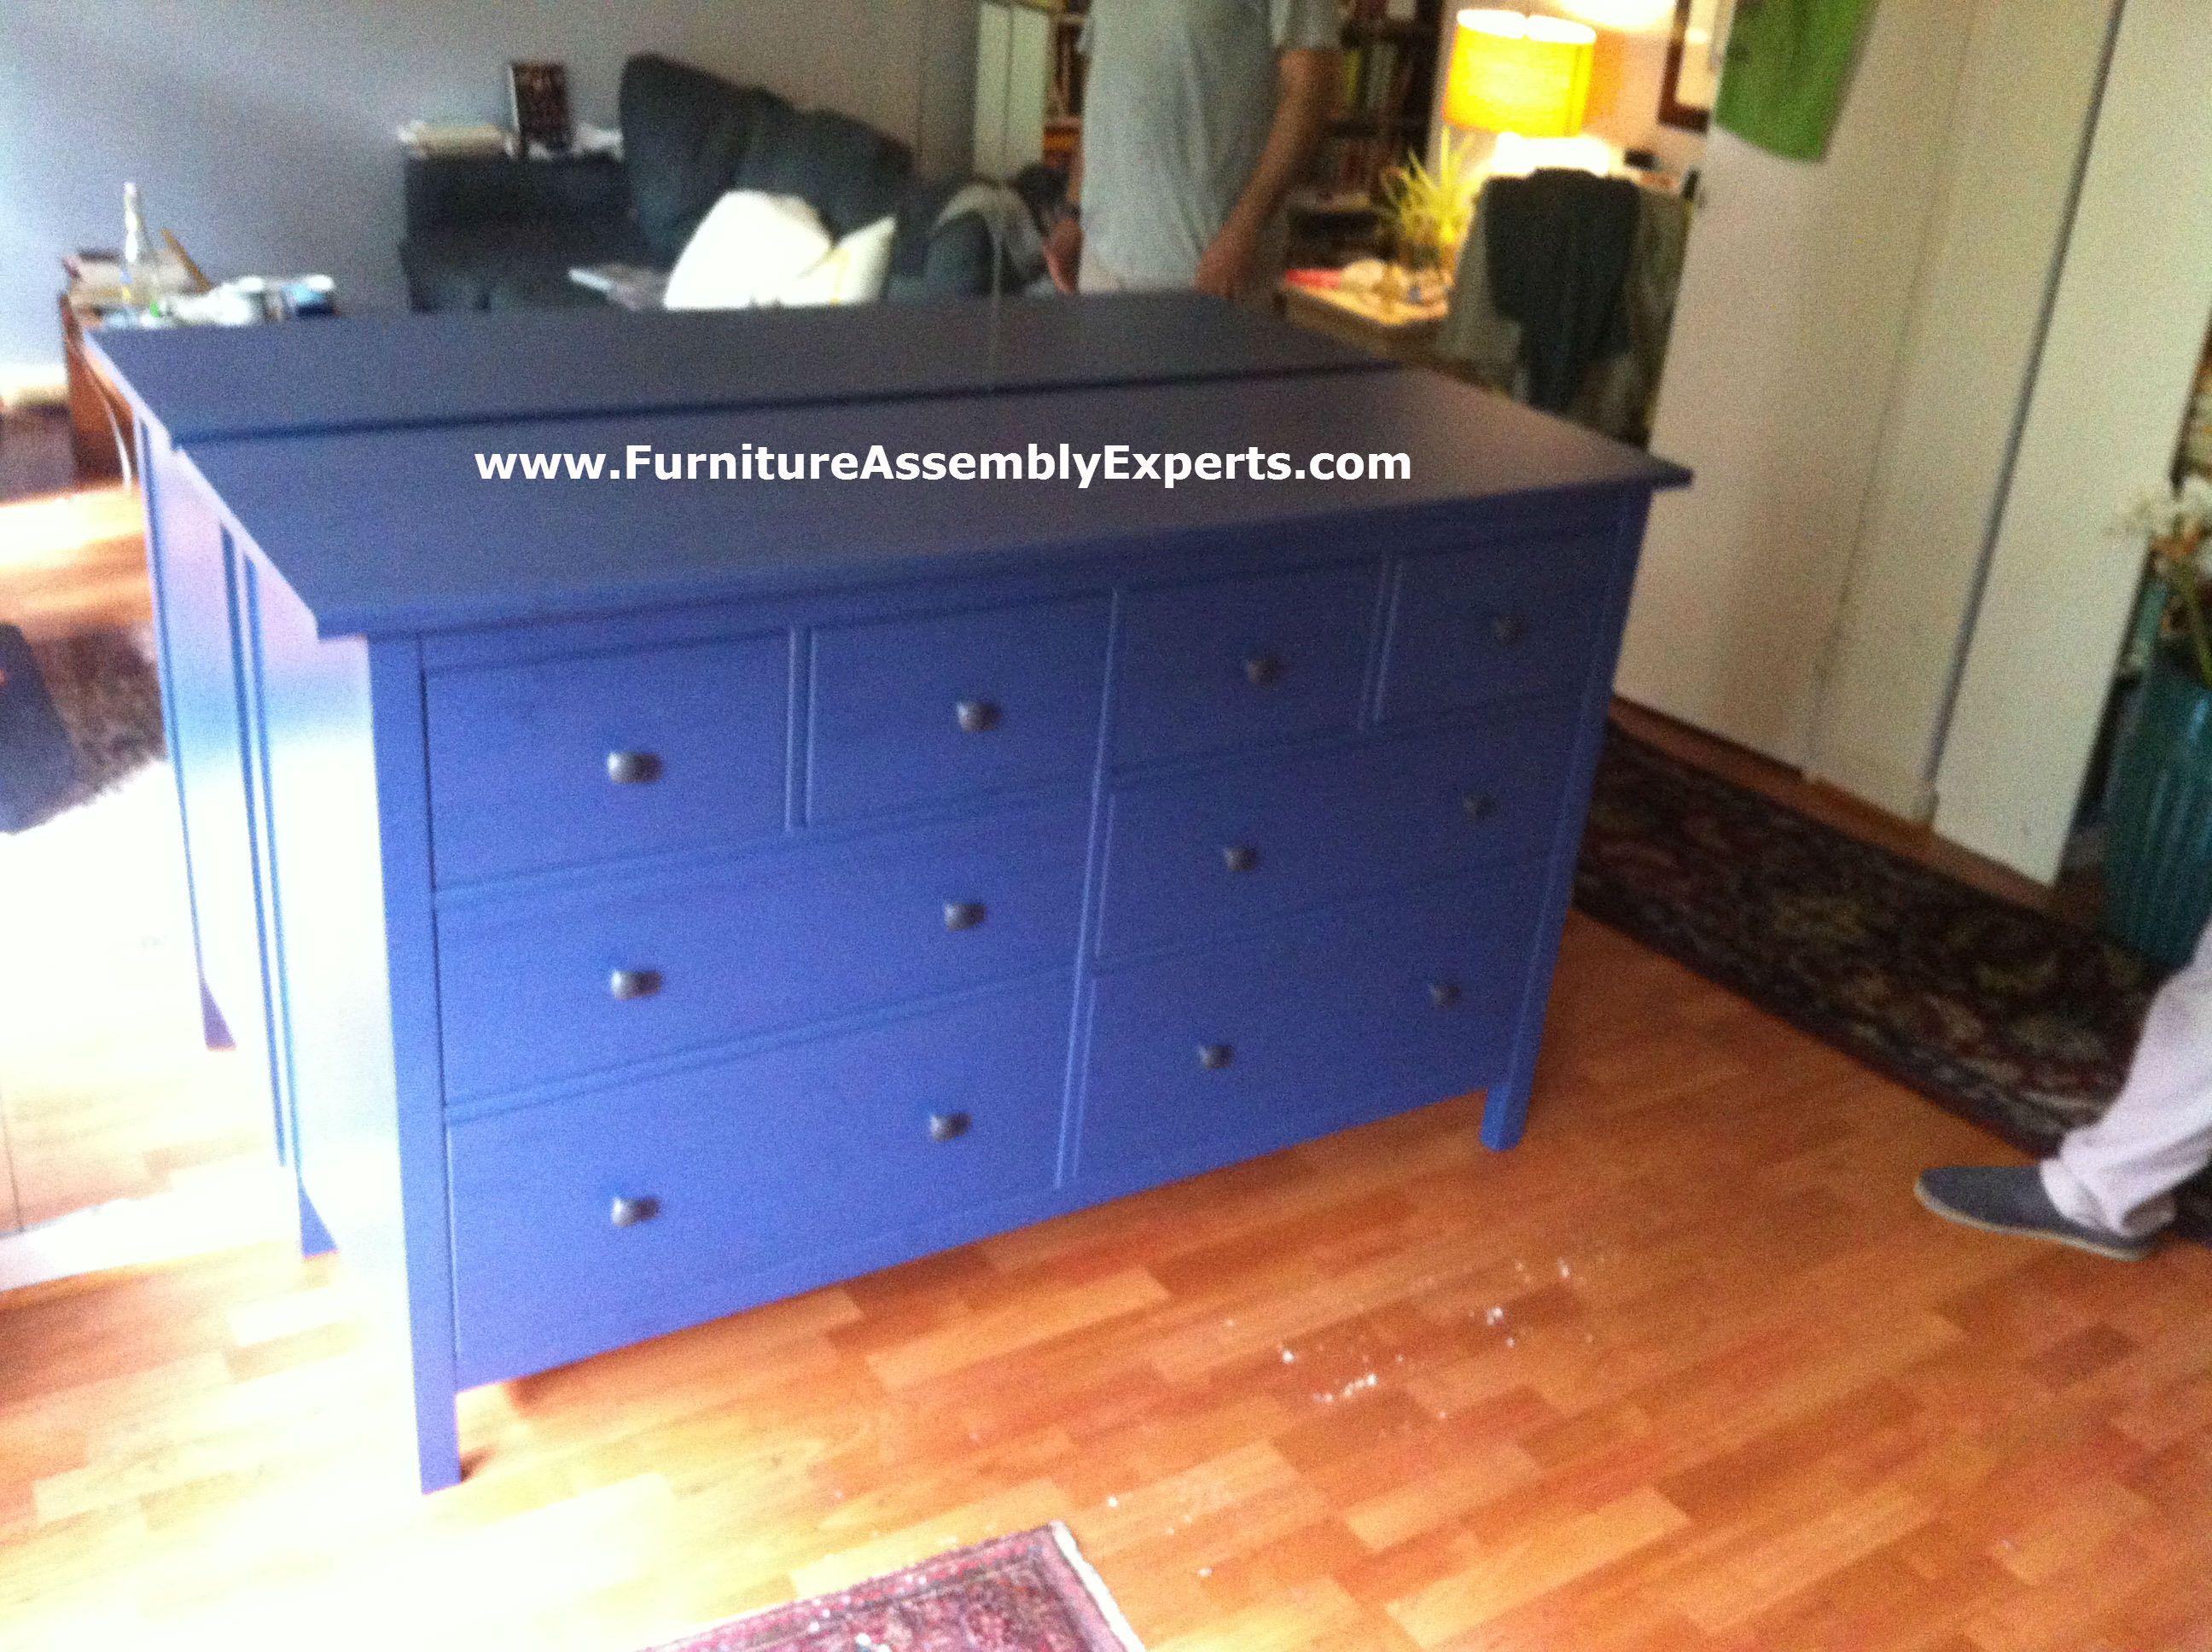 Ikea Hemnes 8 Drawers Dresser Assembled In Reston Va By